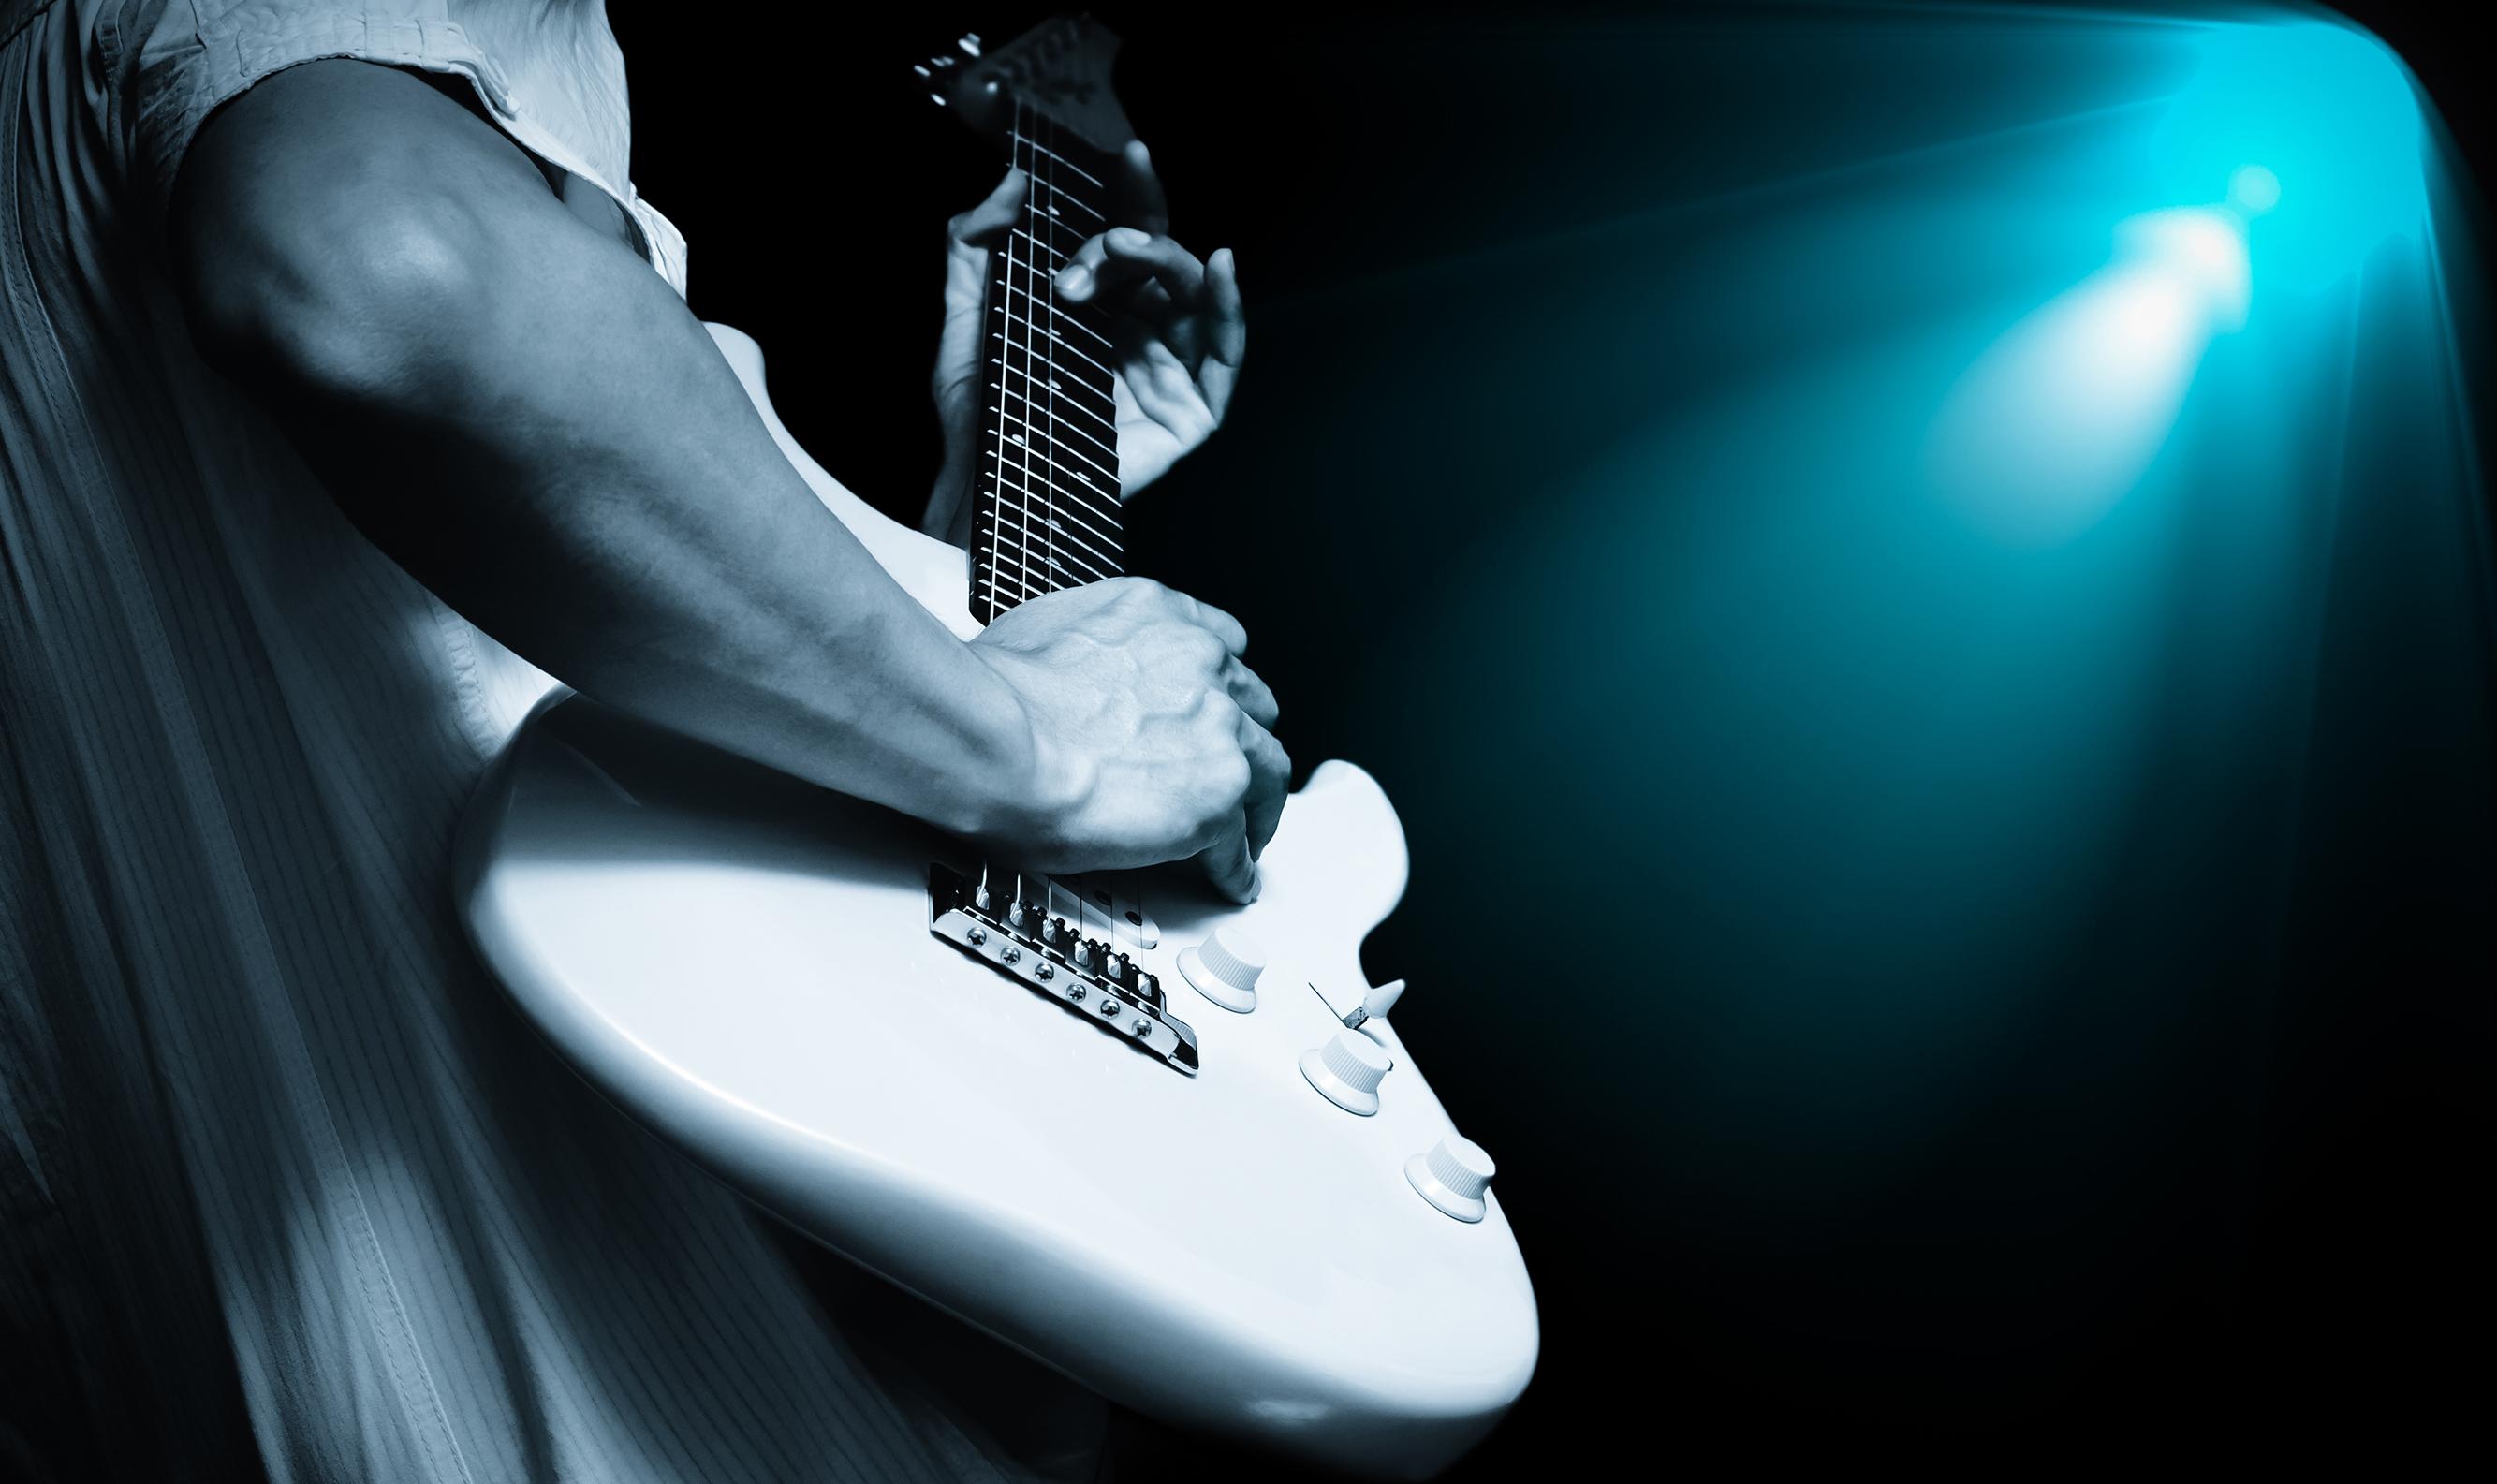 músico, cantante, compositor